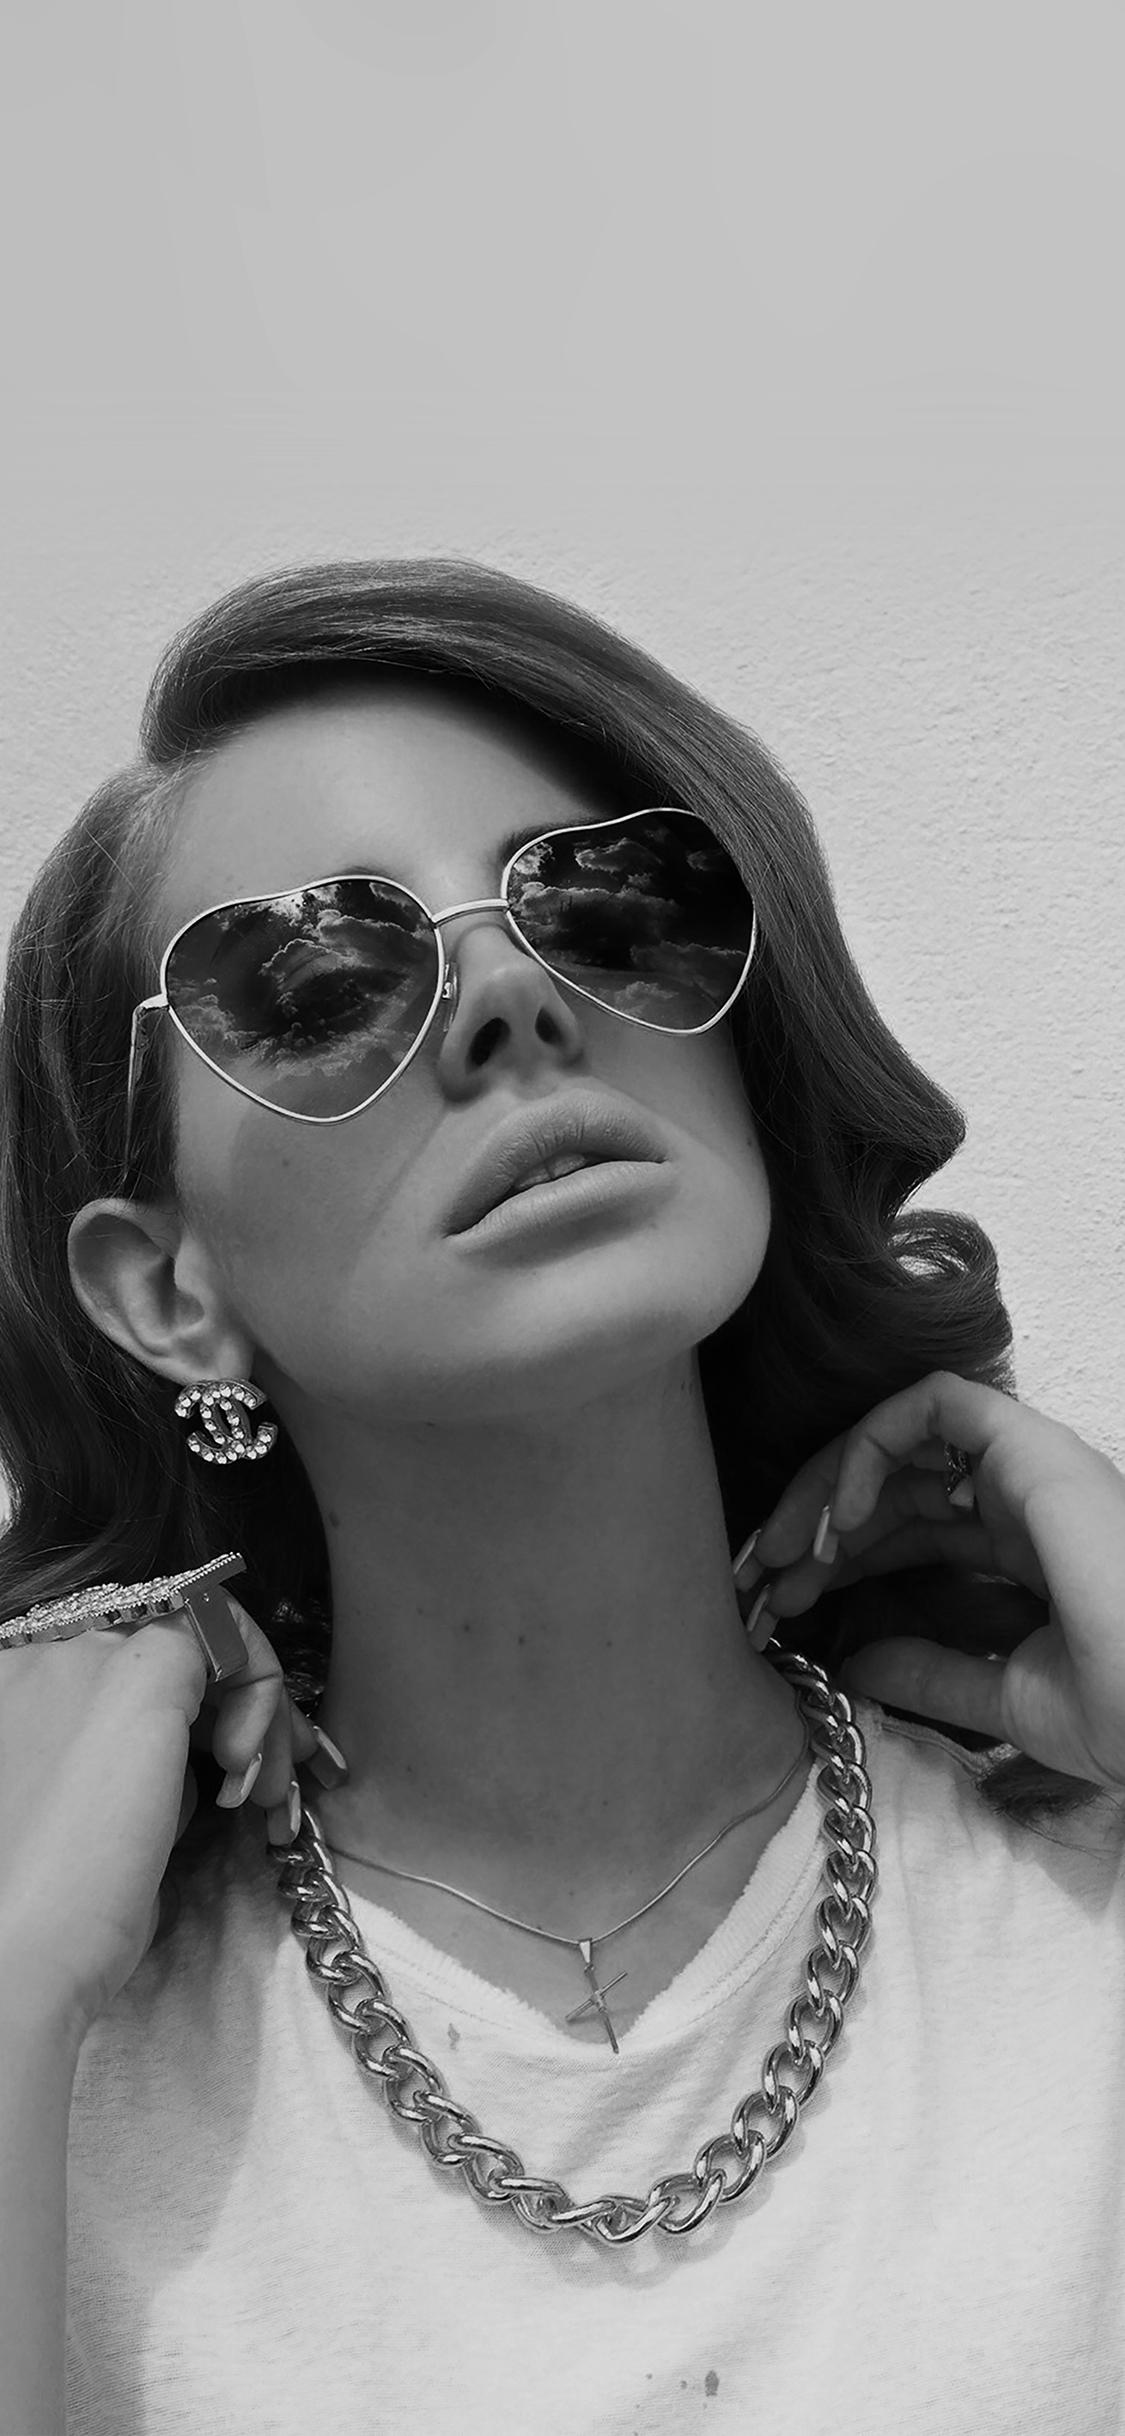 Iphonexpapers Hd10 Lana Del Rey Music Dark Singer Celebrity